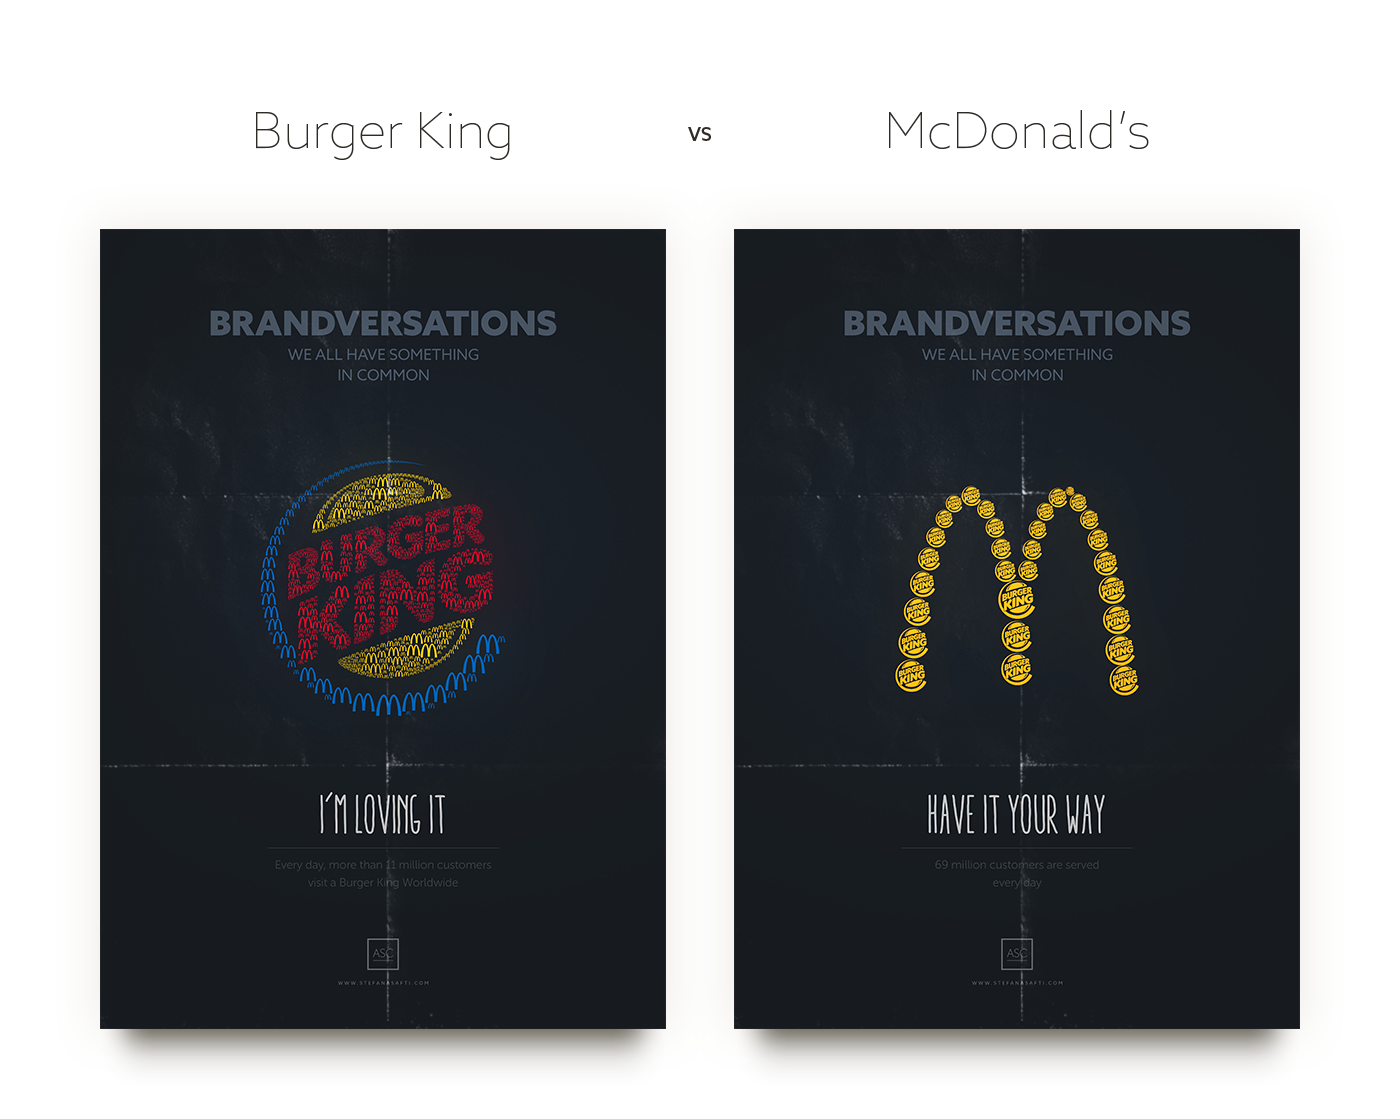 Adobe Portfolio posters brand Nikon Canon McDonalds Coca Cola Burger King apple firefox Internet Explorer asafti Stefan Microsoft